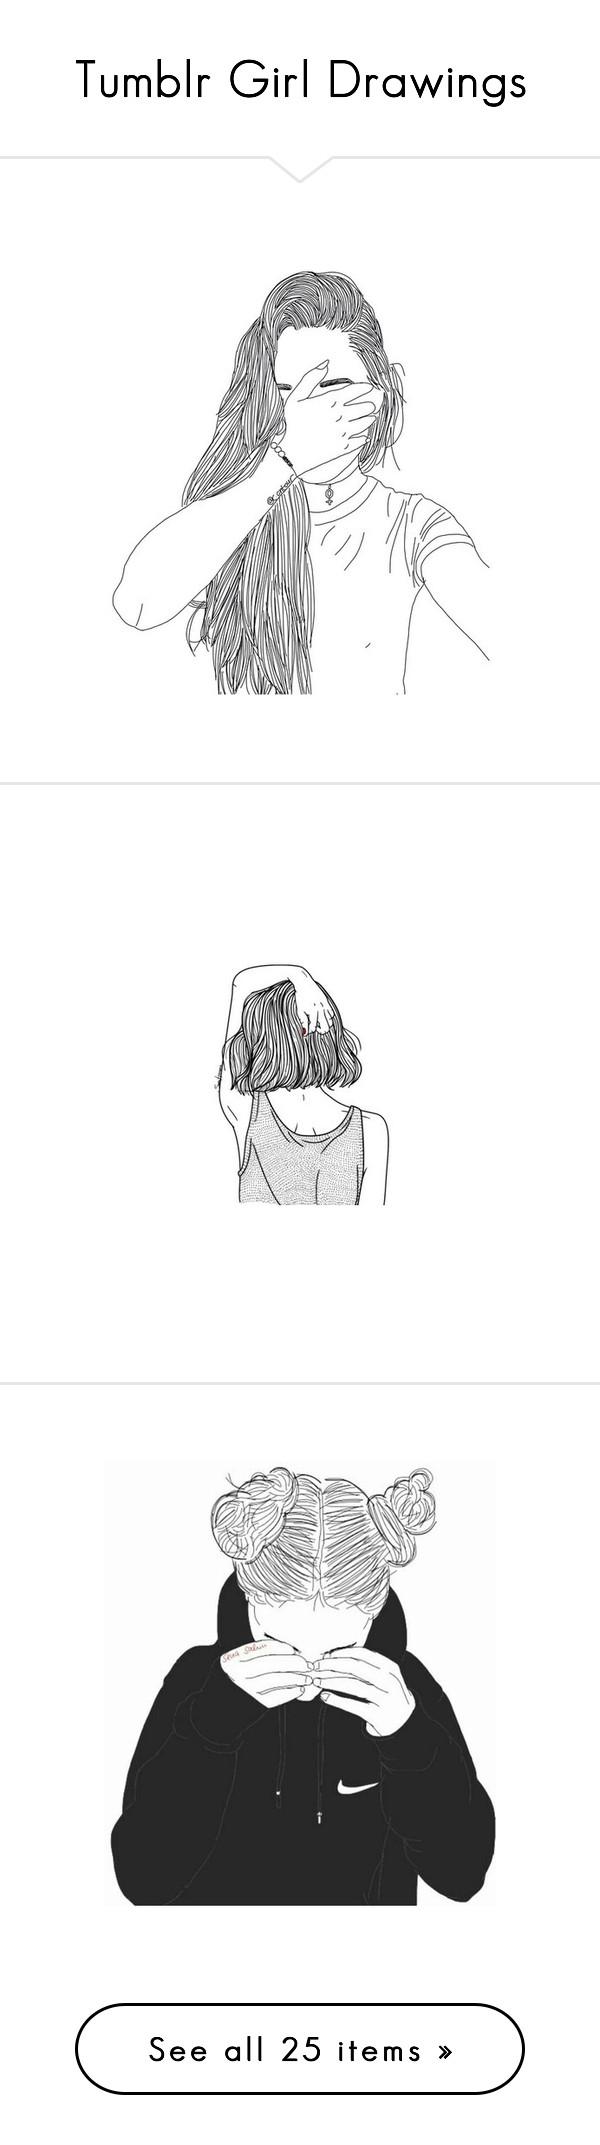 Drawn quote art tumblr Drawings